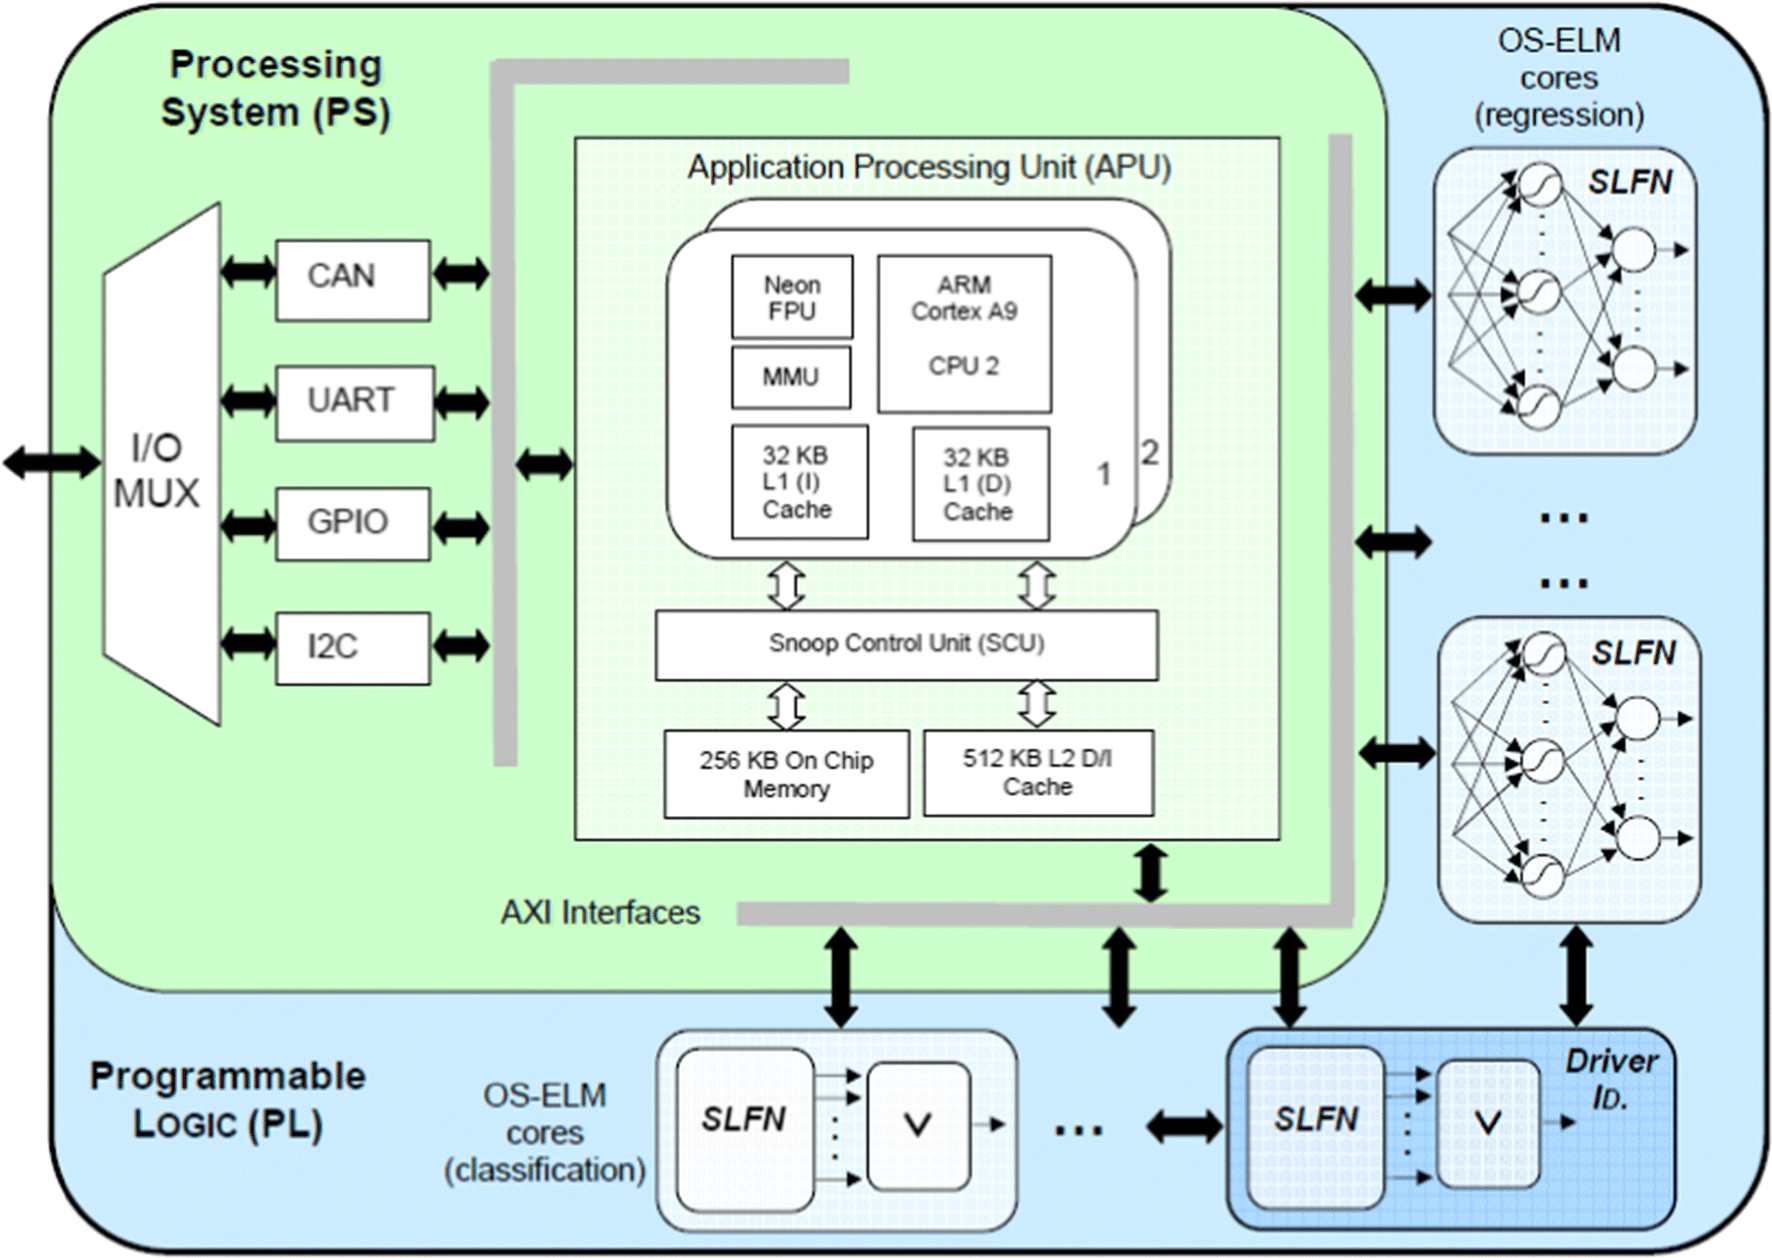 A versatile hardware/software platform for personalized